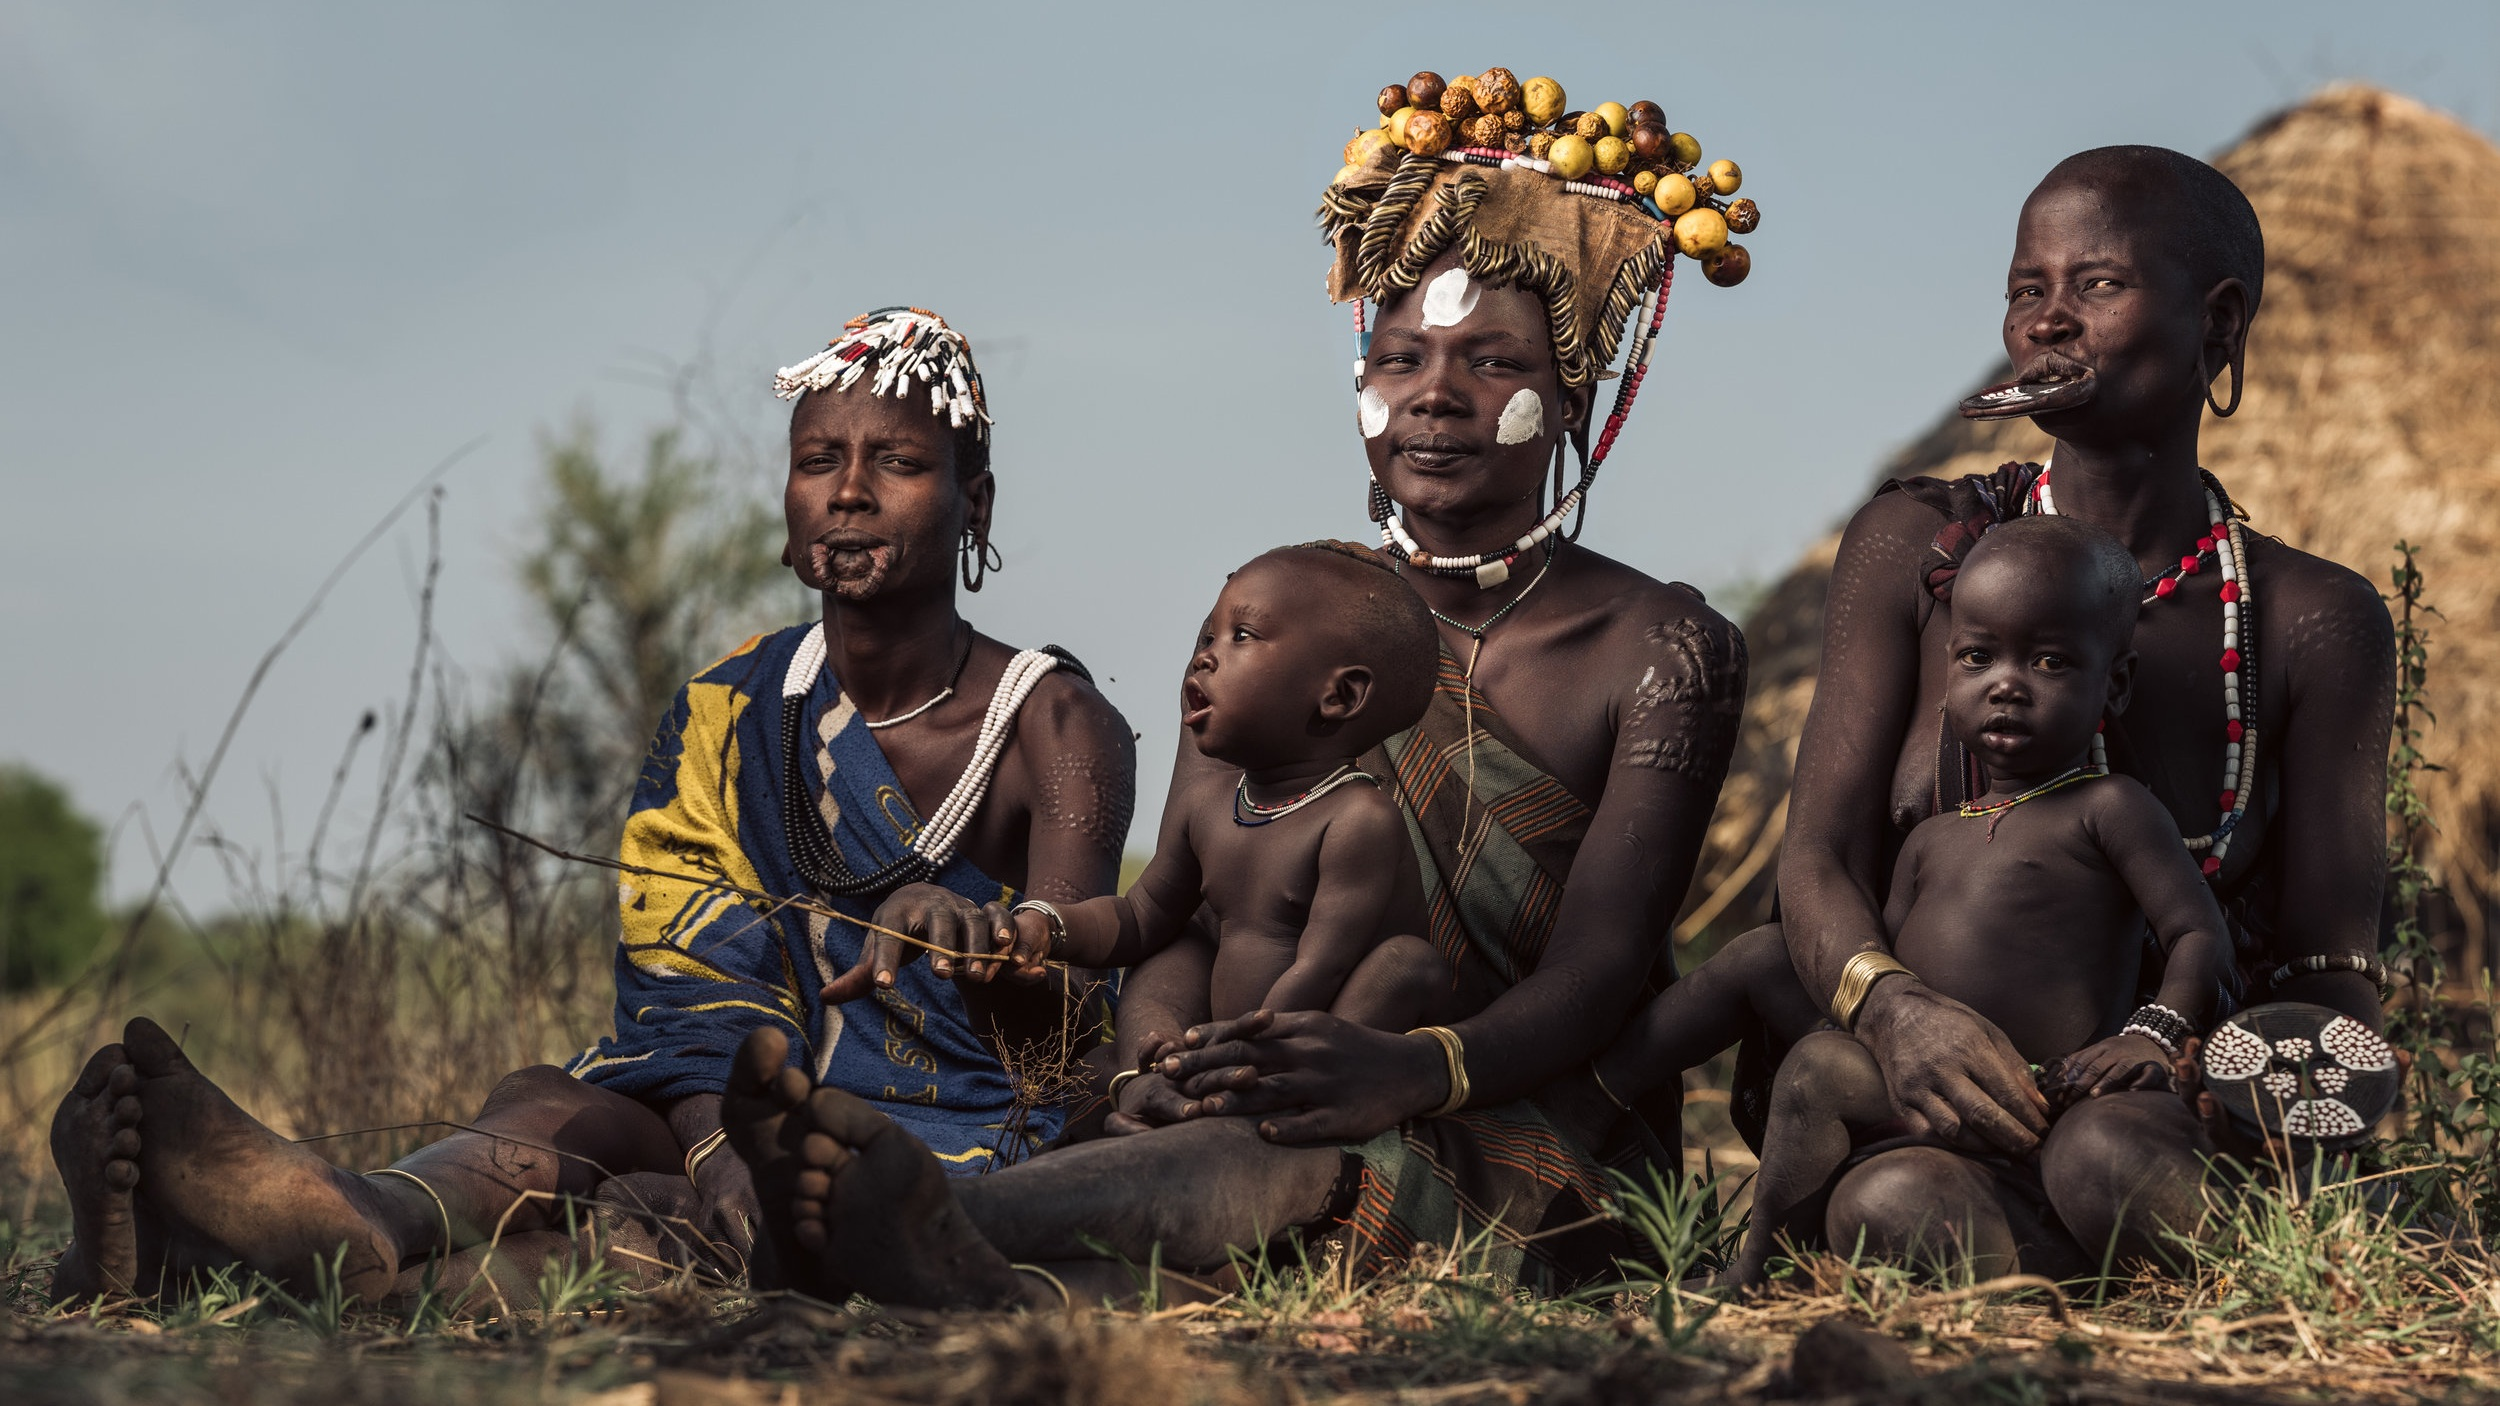 Three women from the Mursi tribe